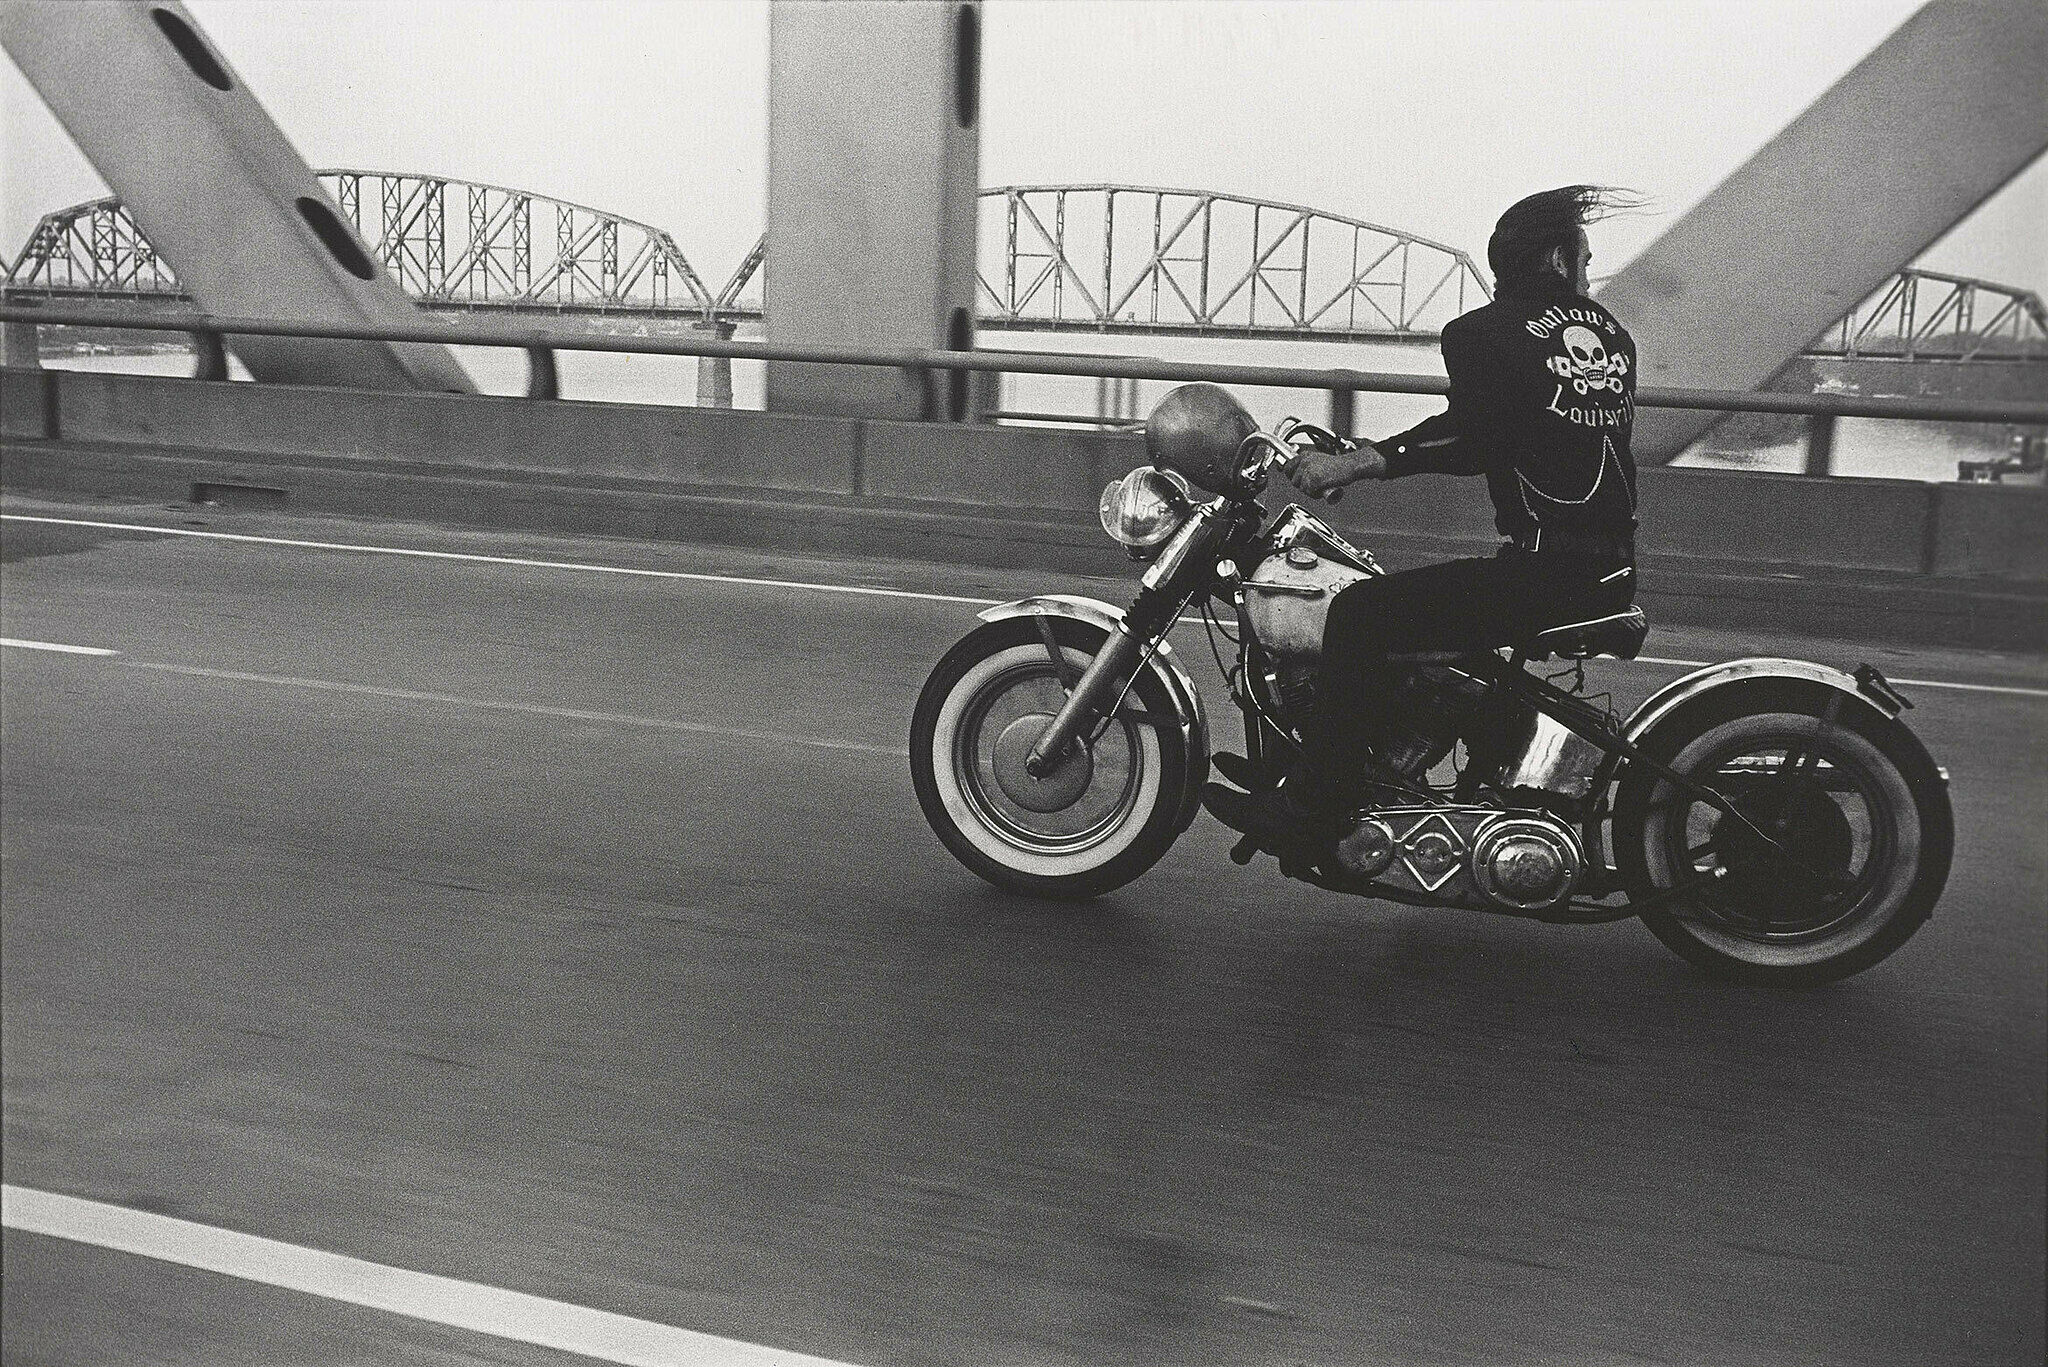 A work by Danny Lyon. A man driving a motorcycle across a bridge